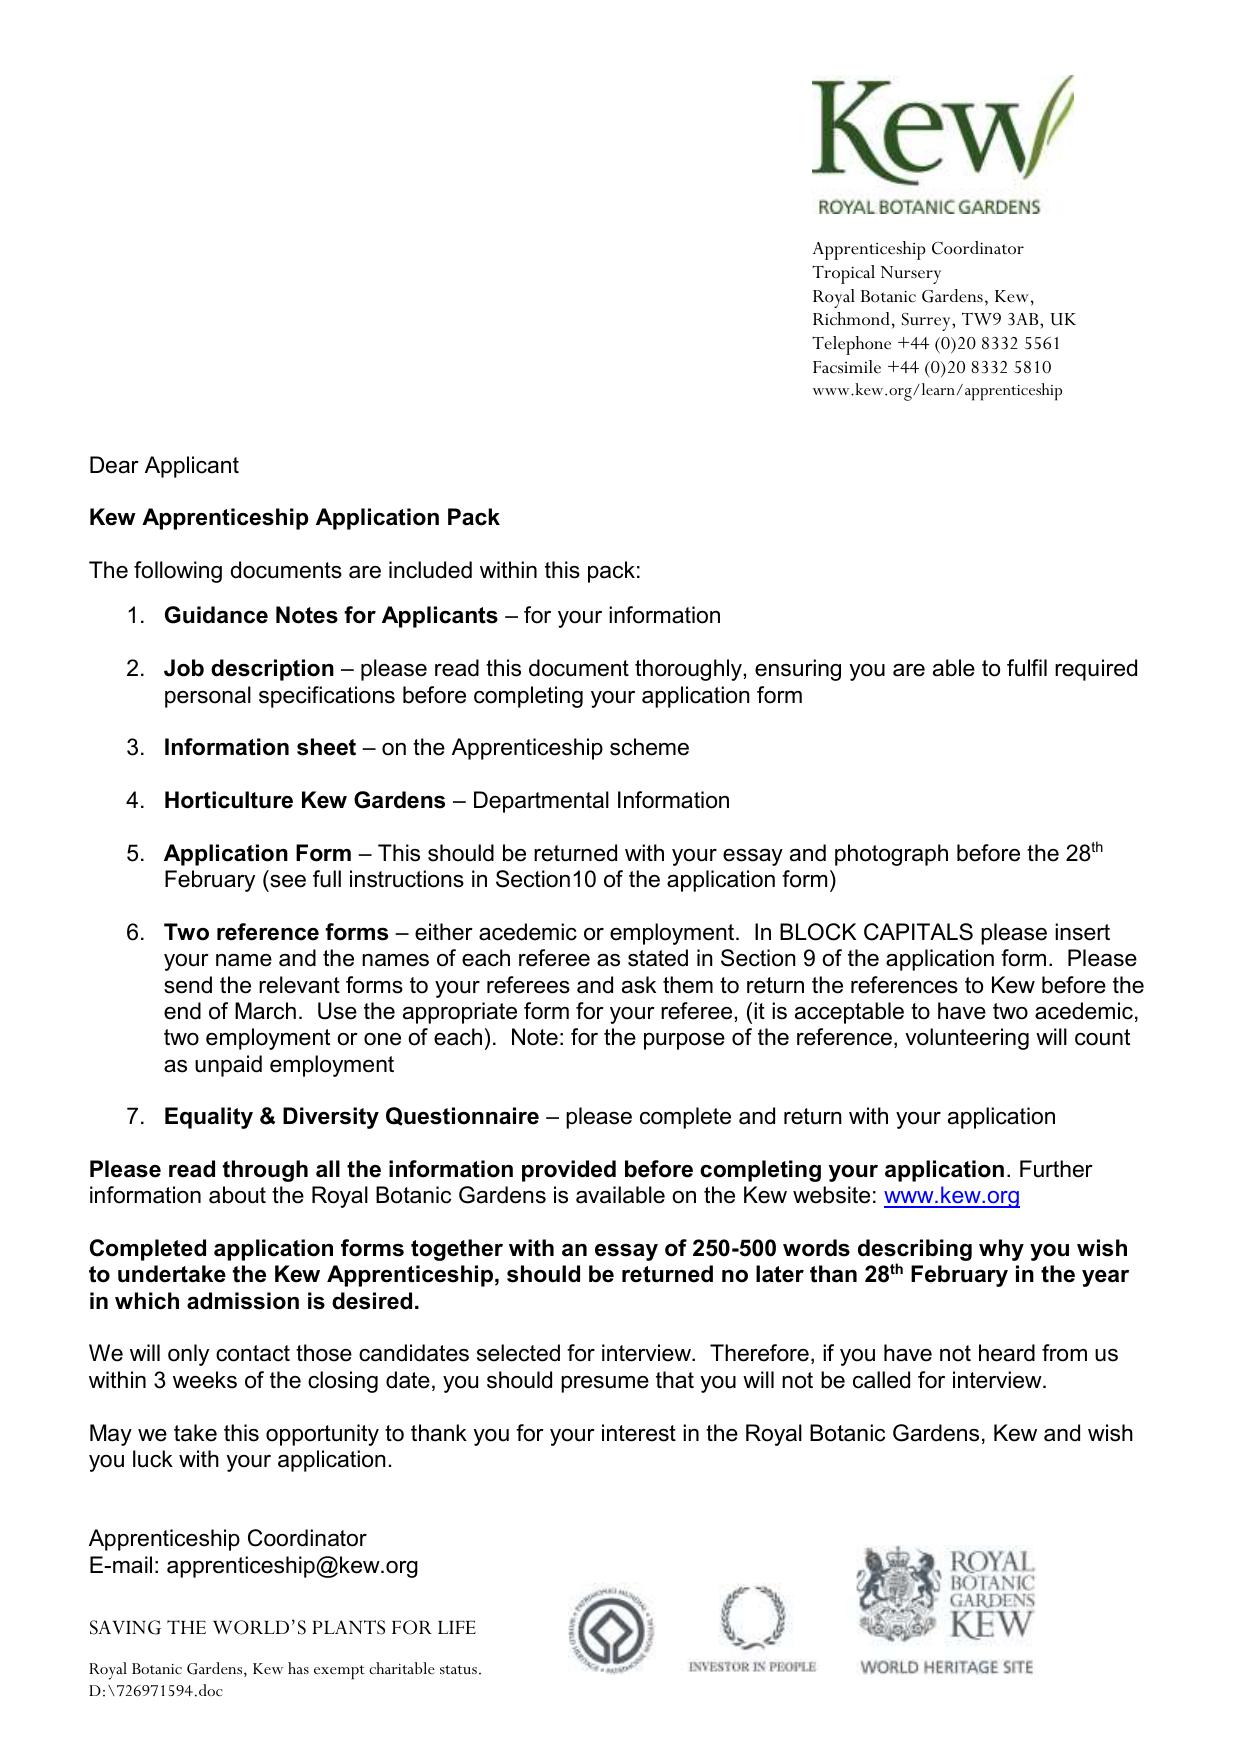 application form - Royal Botanic Gardens, Kew